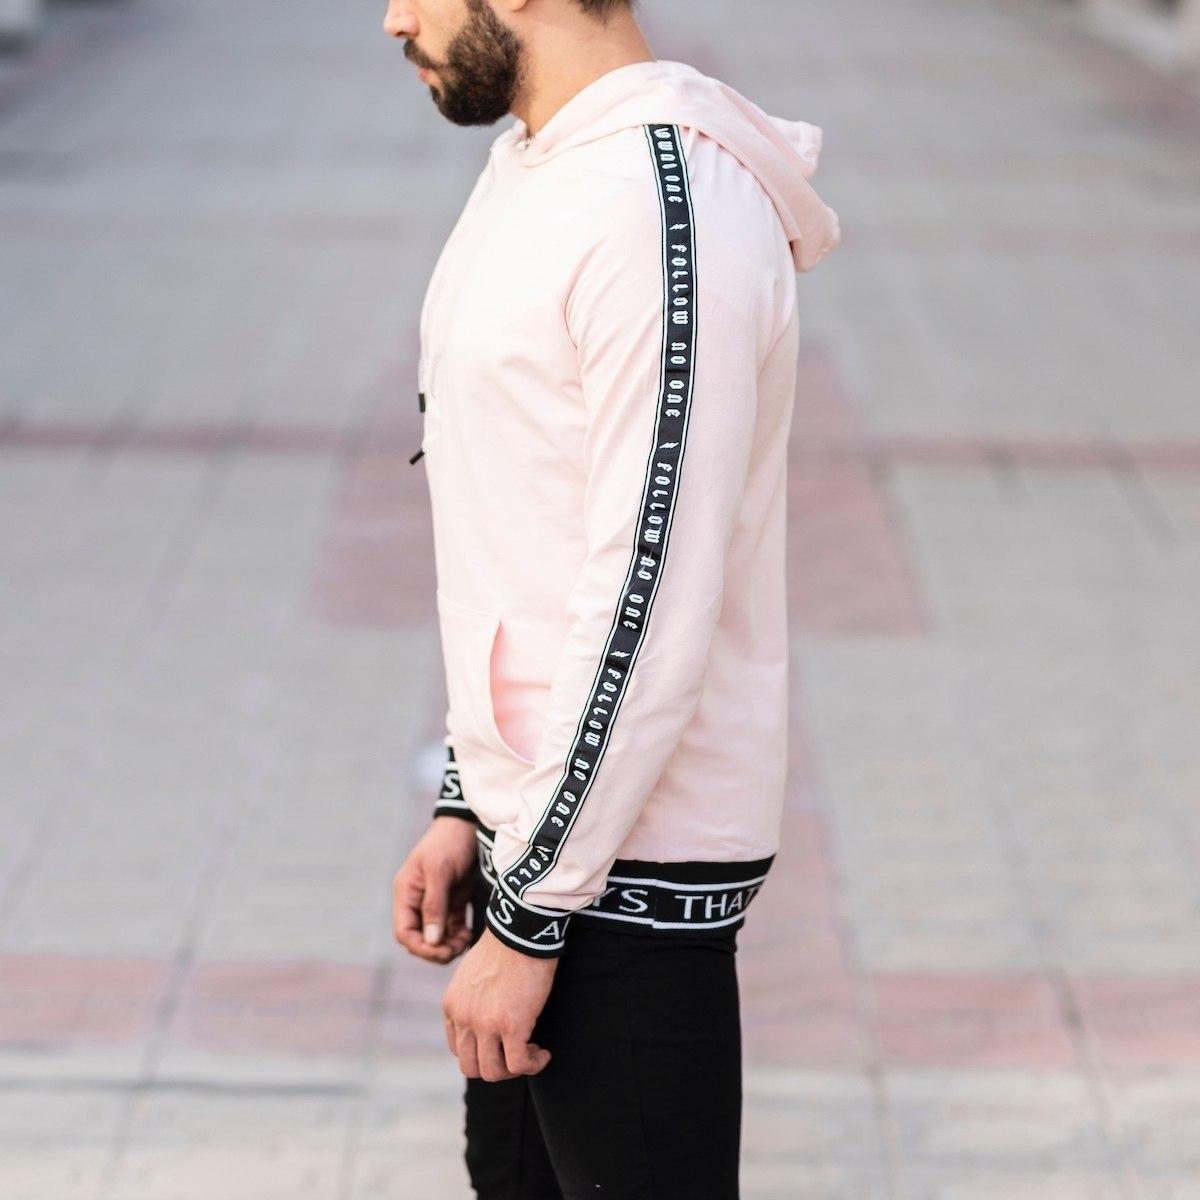 Pink Sweatshirt With Text...